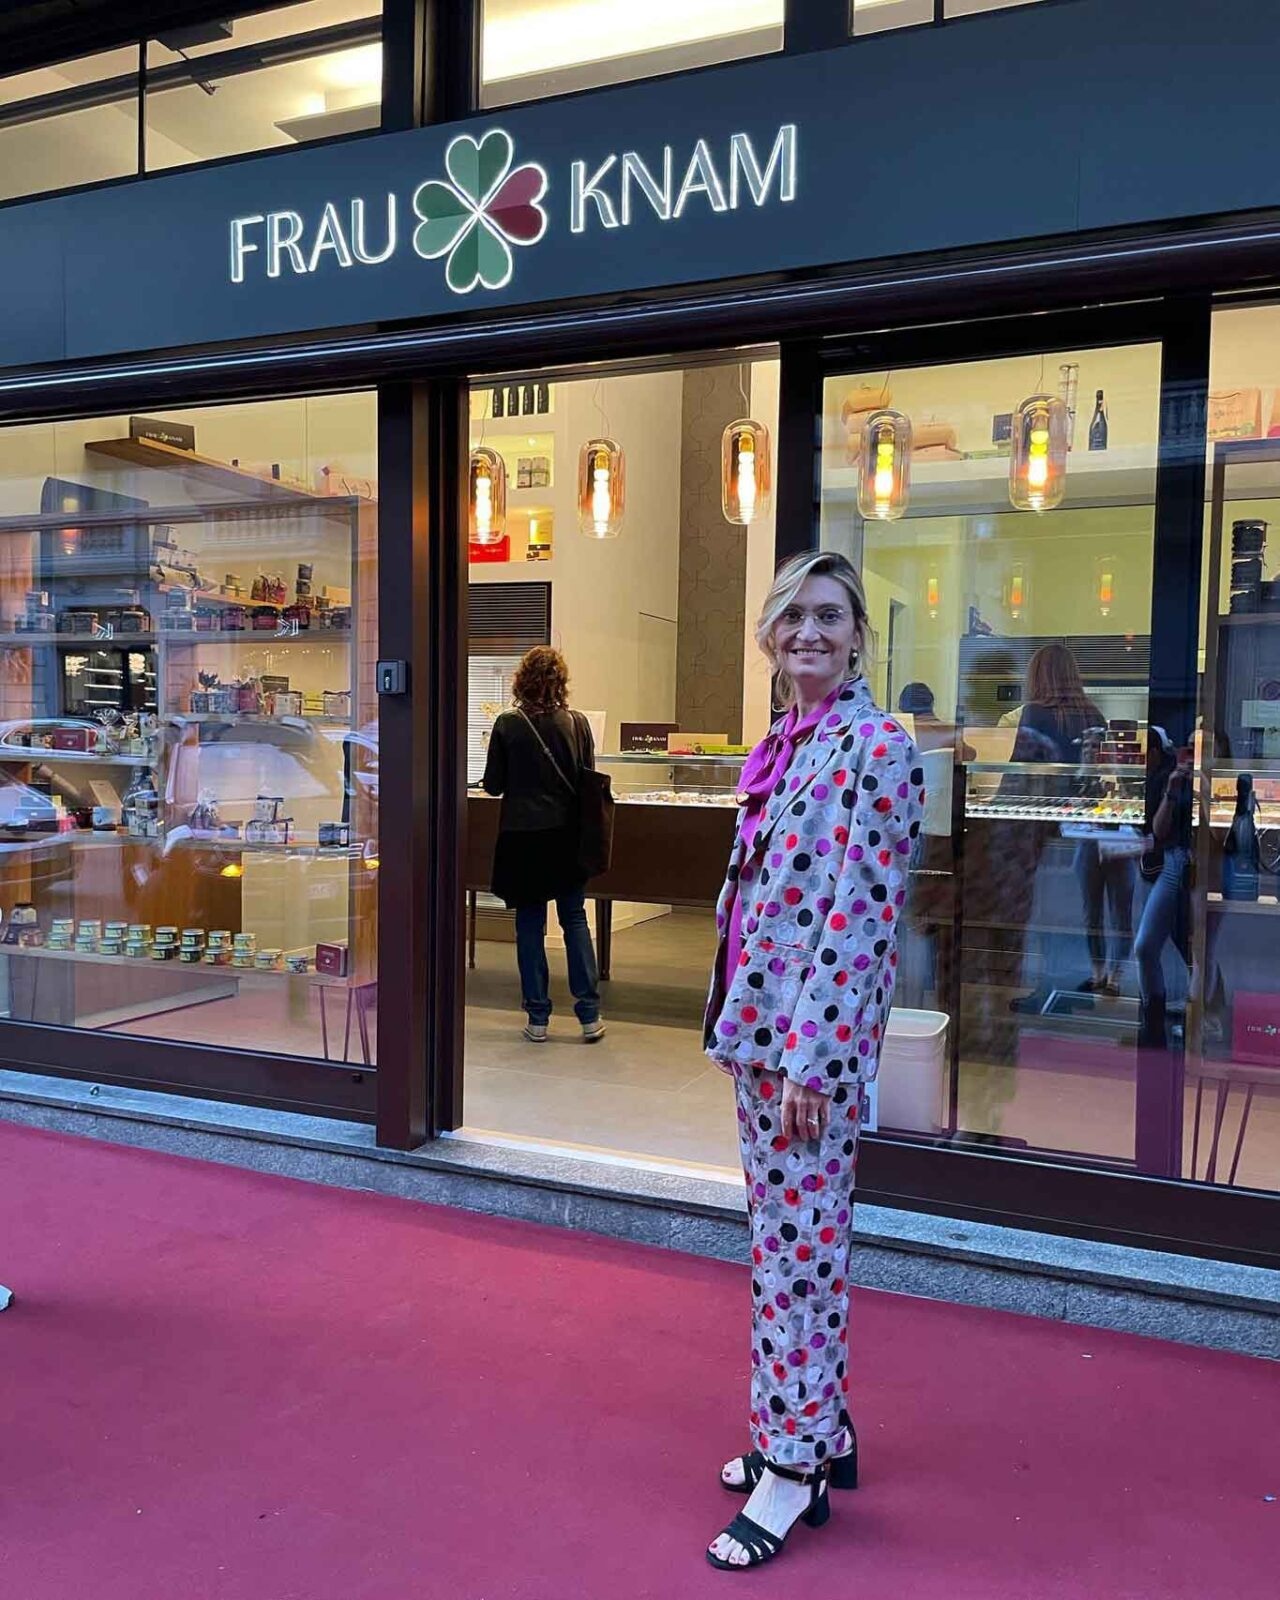 Frau Knam pasticceria nuove aperture ottobre milano